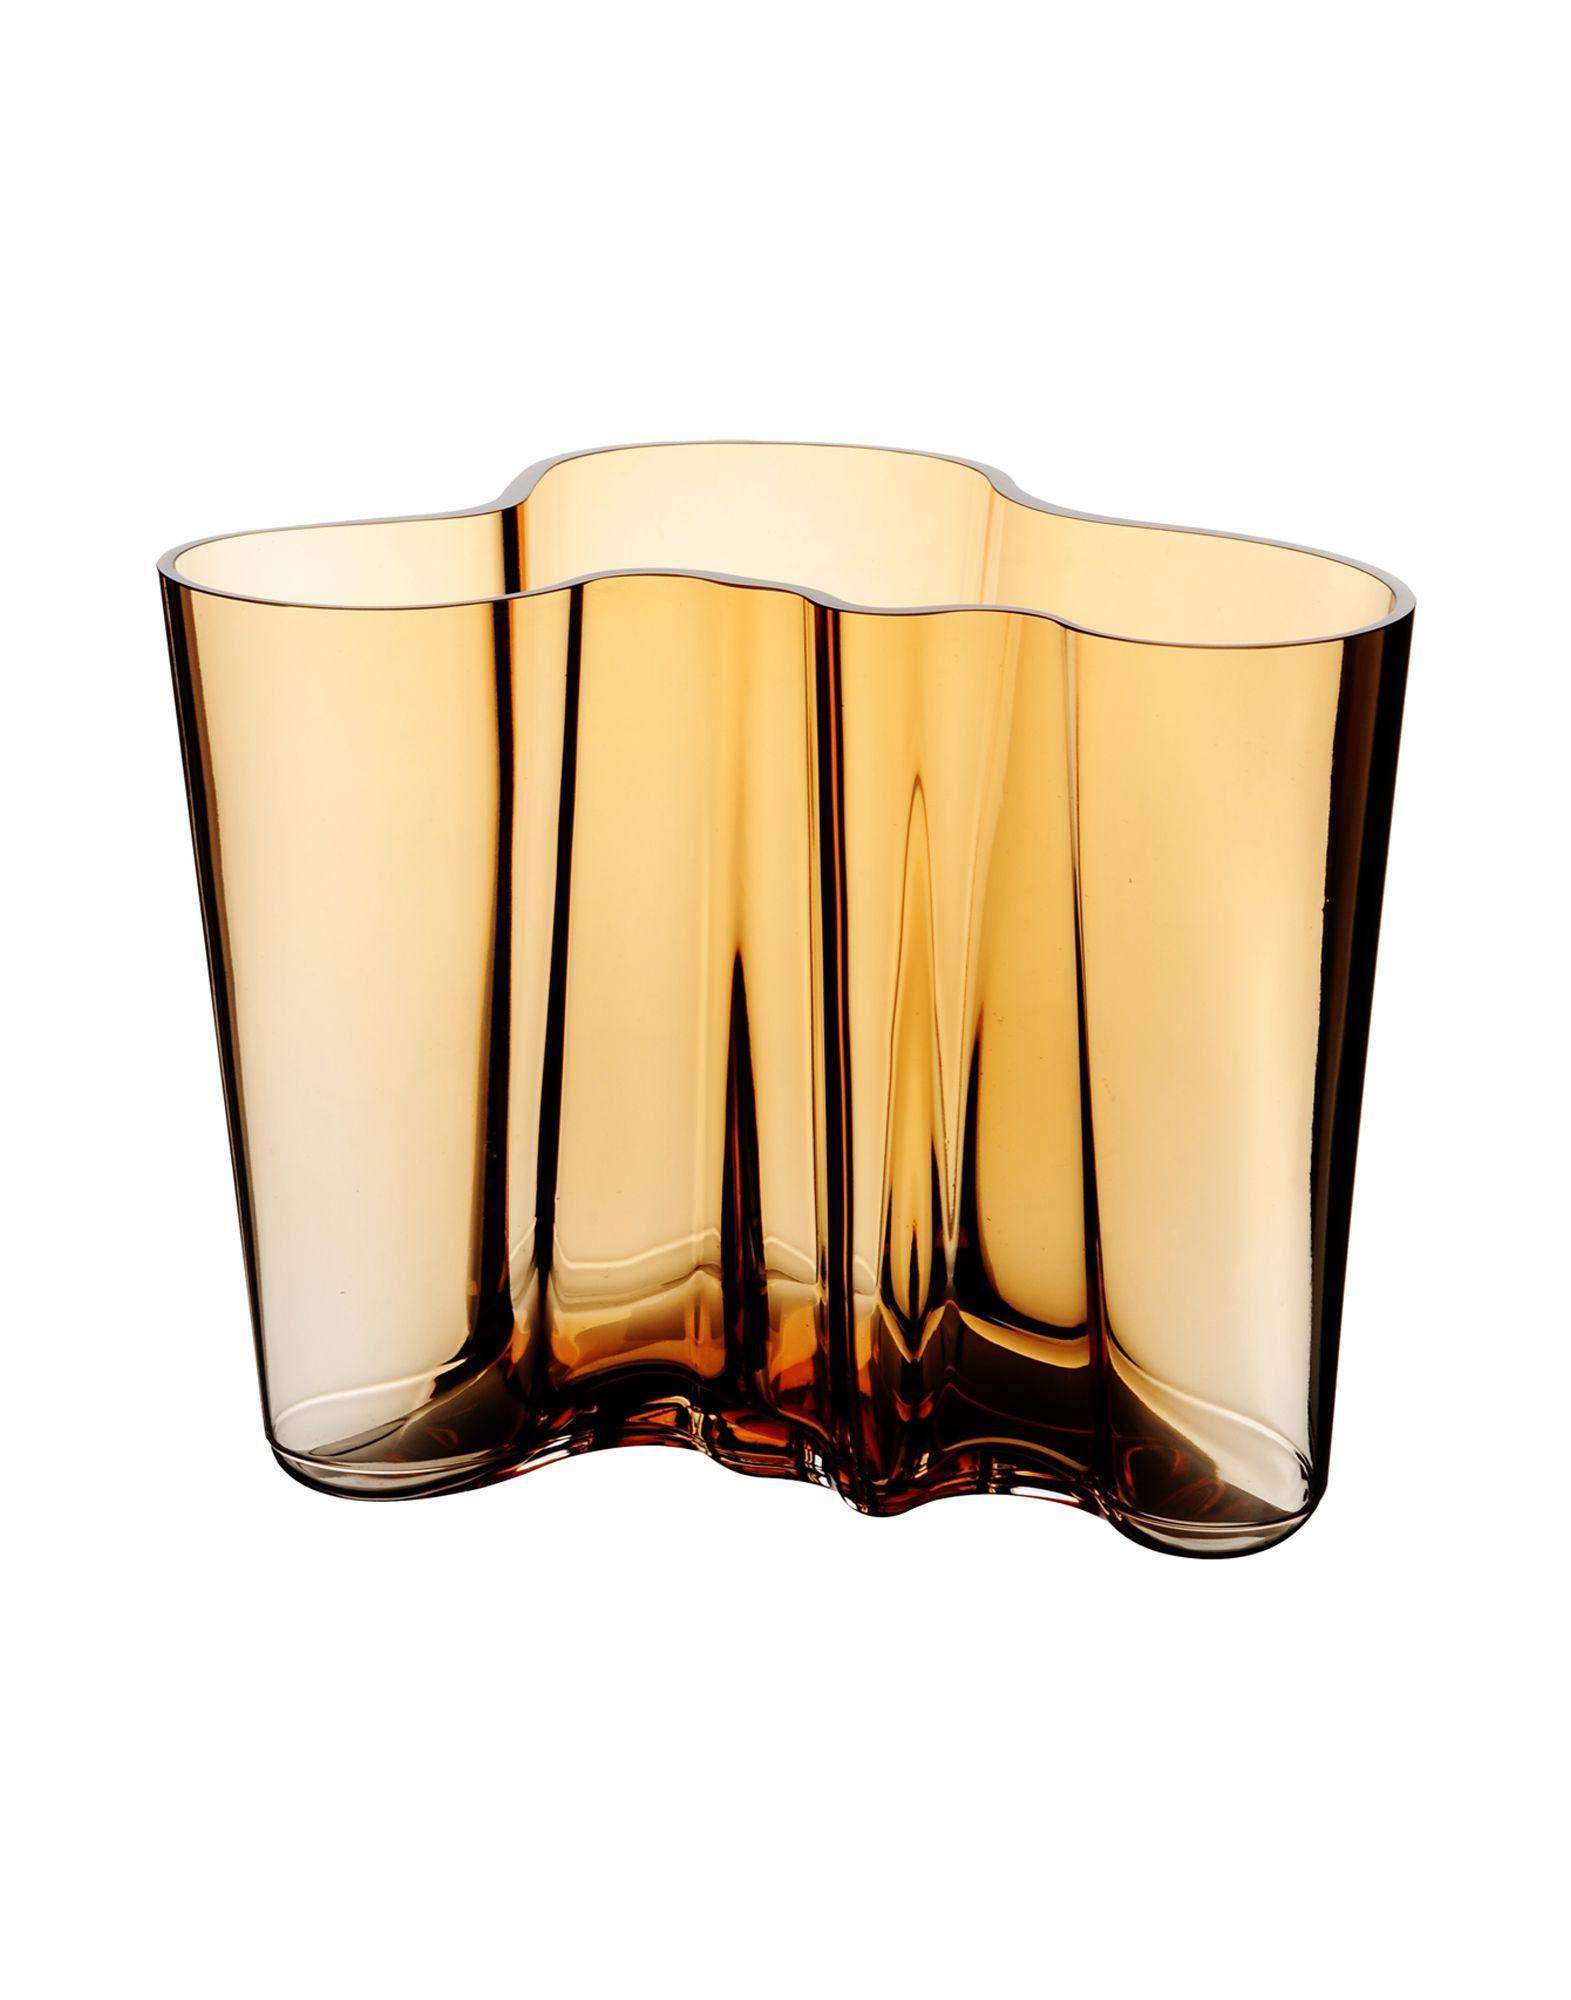 IITTALA Vases